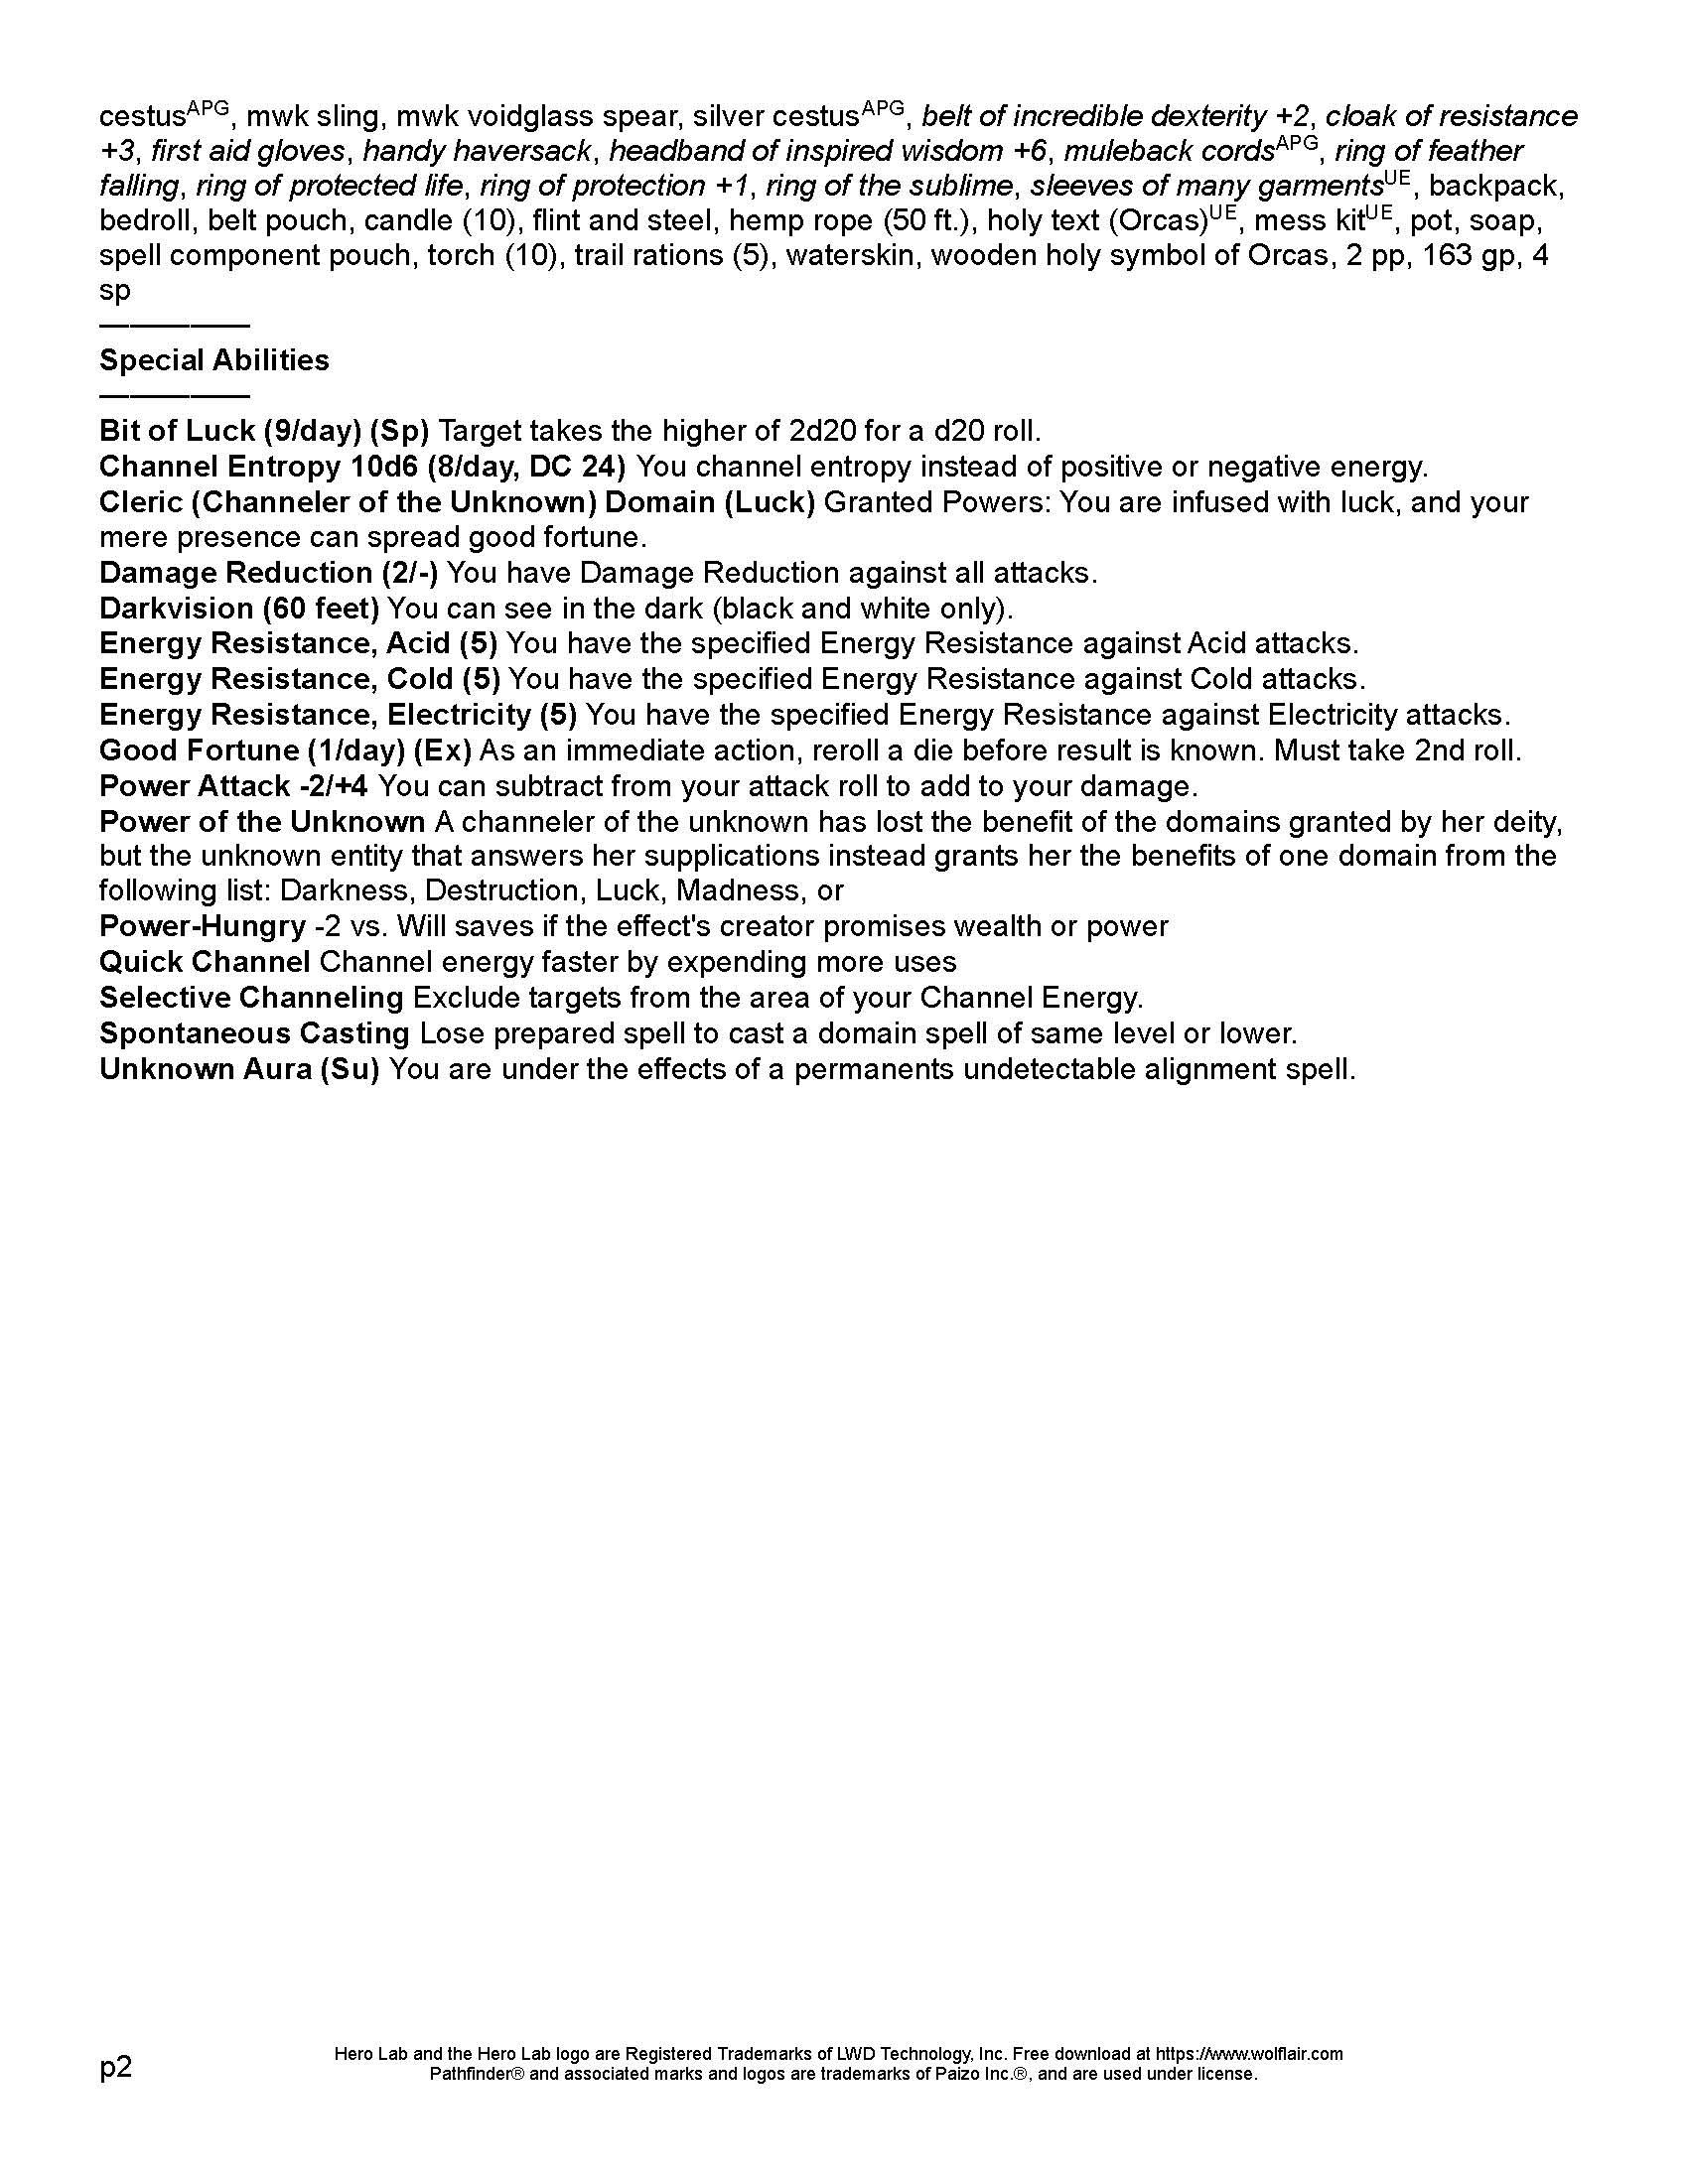 RealmSheet_Page_2.jpg